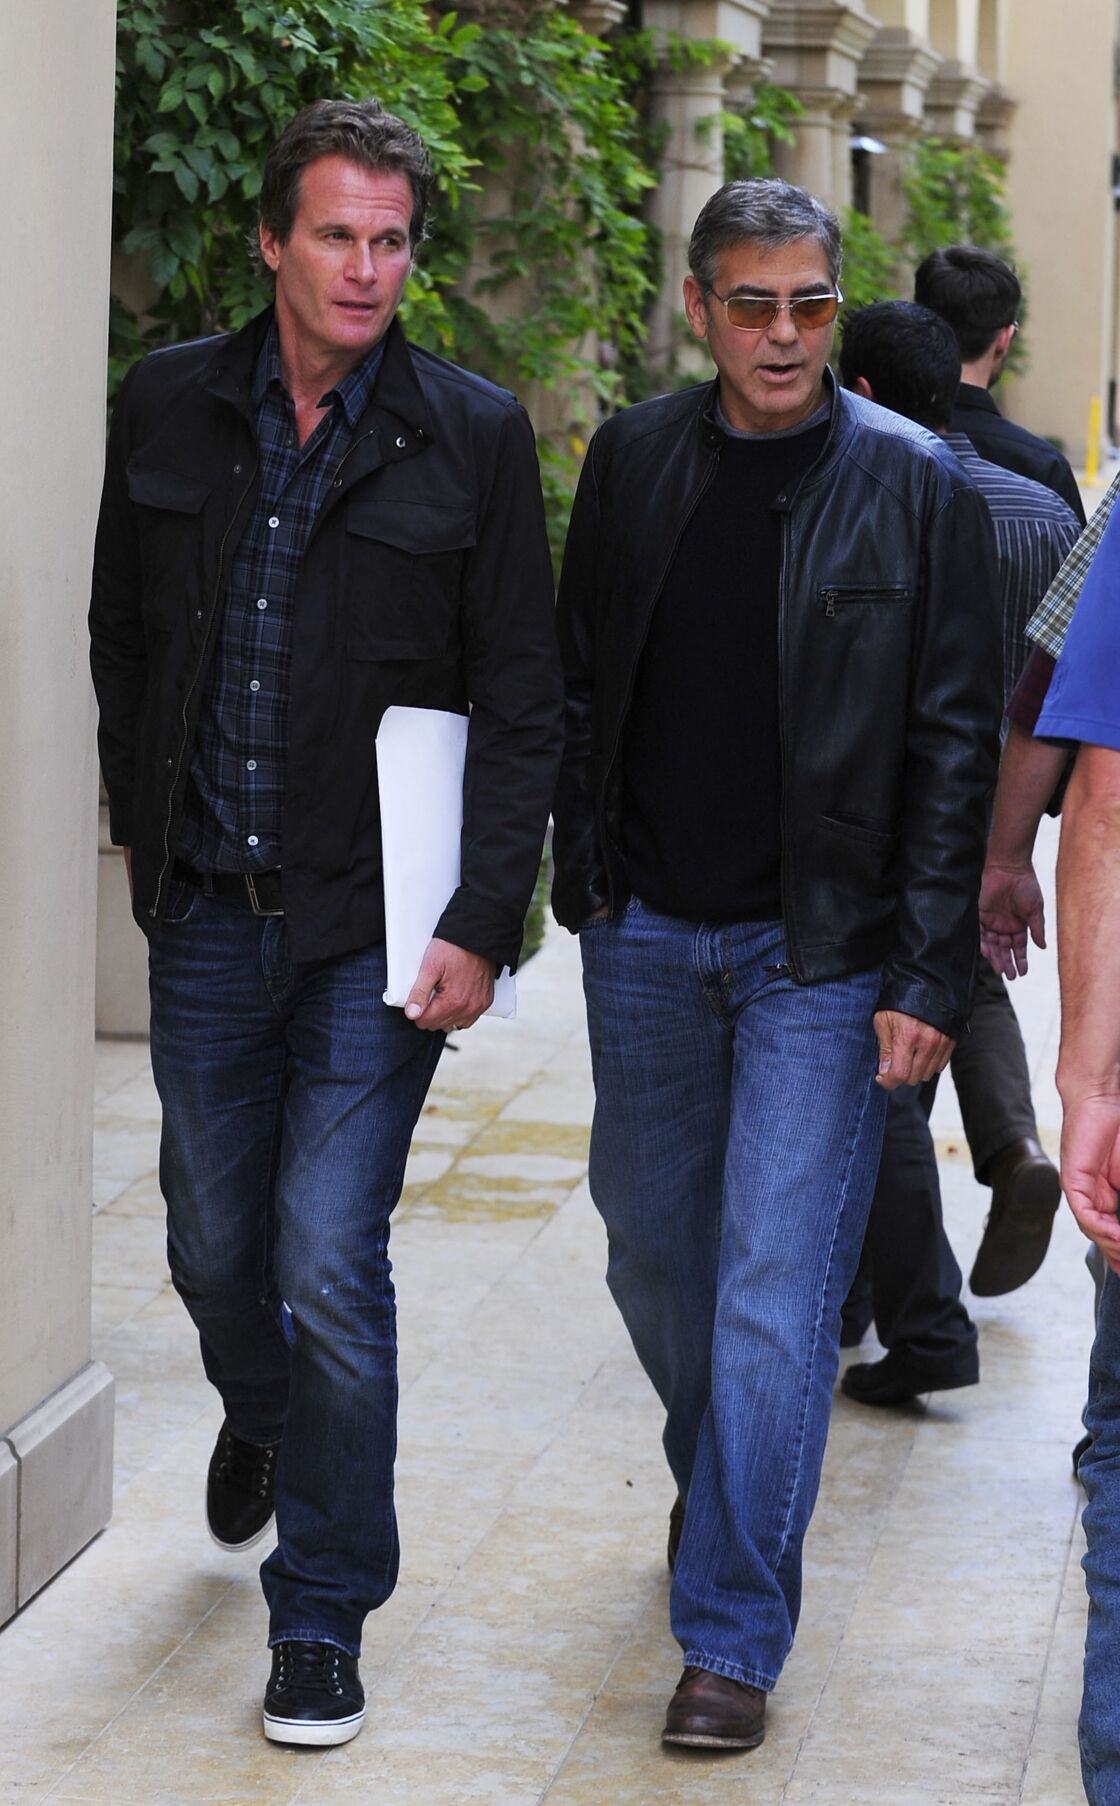 George Clooney et Rande Gerber quittent un restaurant a Beverly Hills le 11 octobre 2012